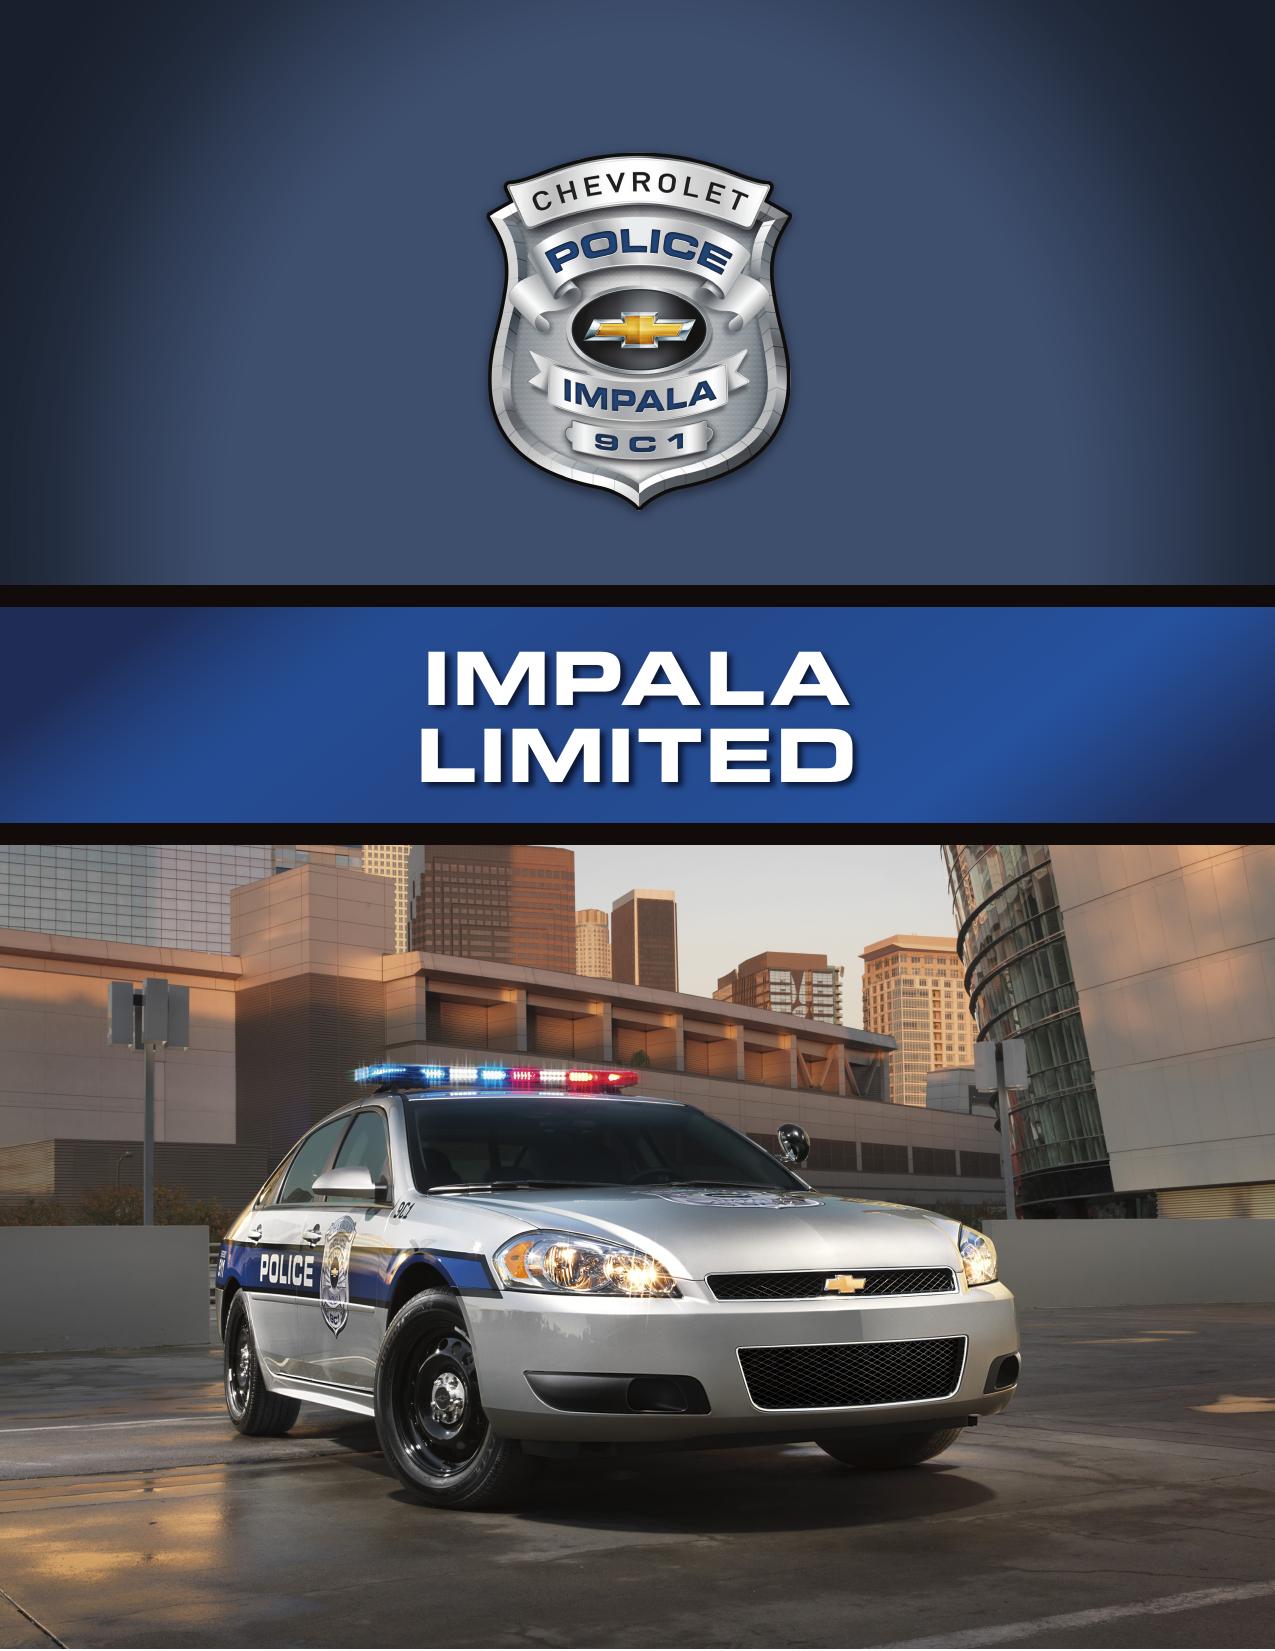 impala limited kerr industries manualzz com unmarked chevy impala police car 2013 impala technical guide (pdf) gm